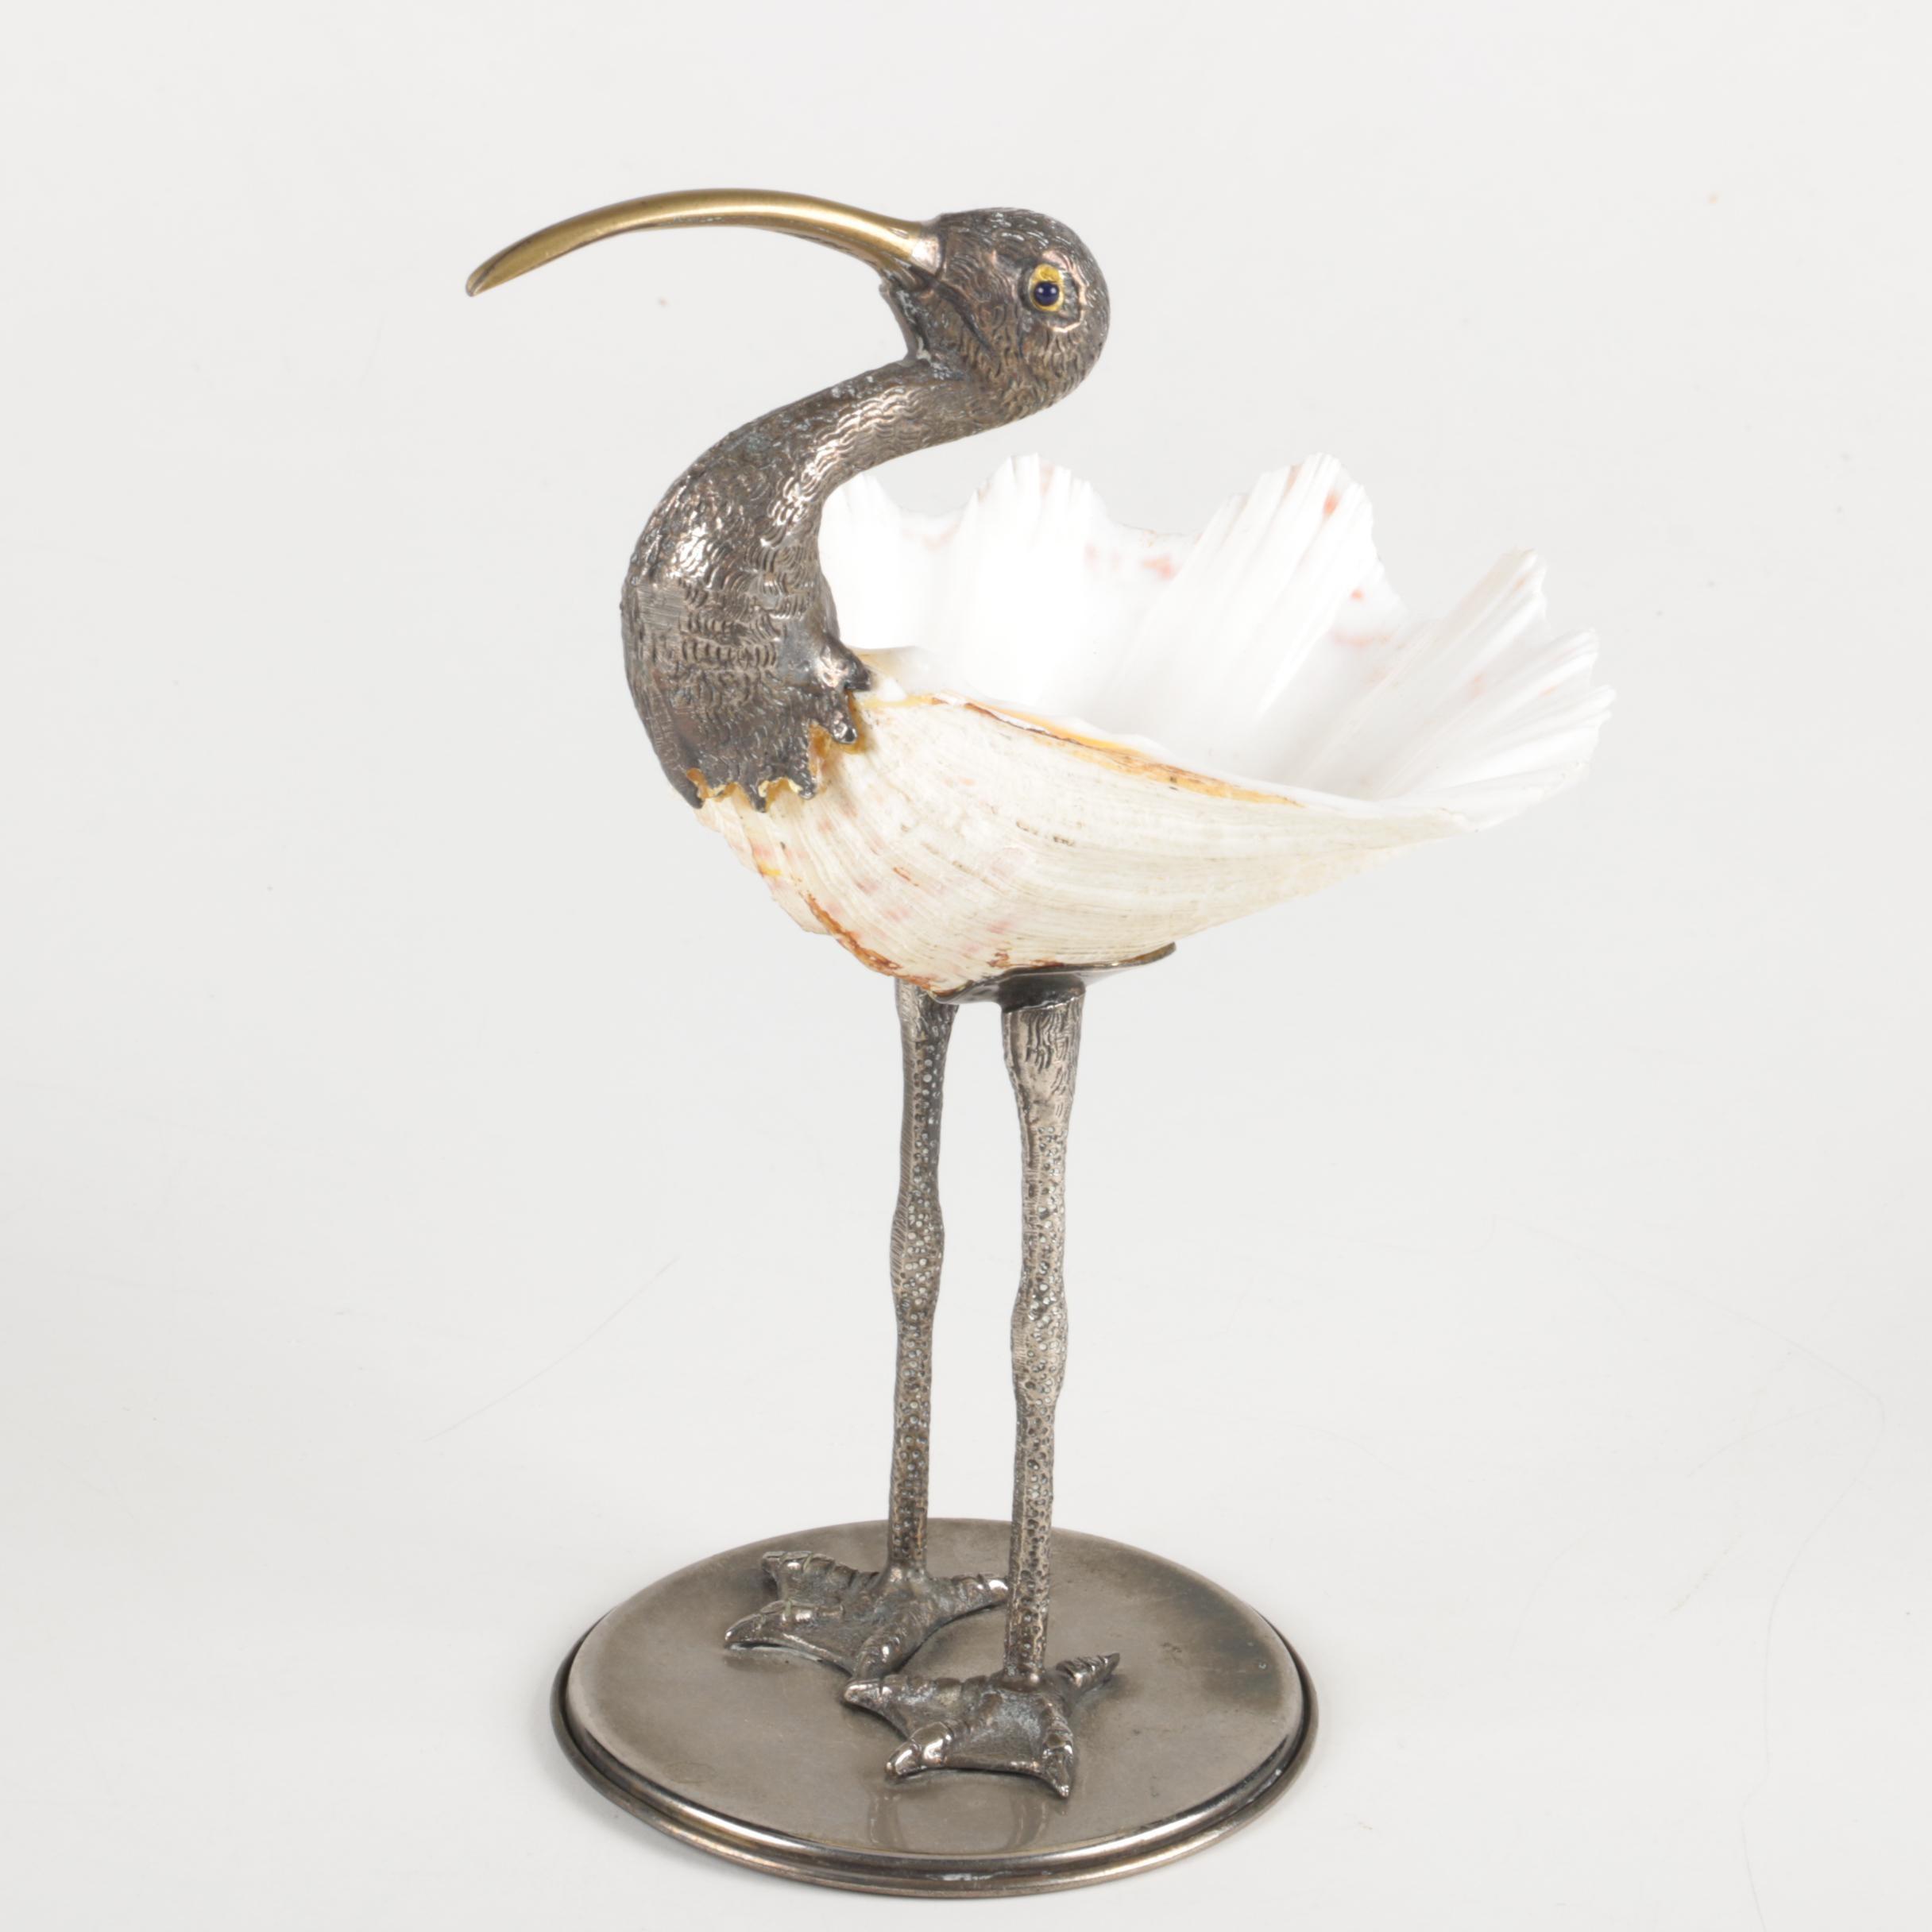 Binazzi Firenze Crane Figurine